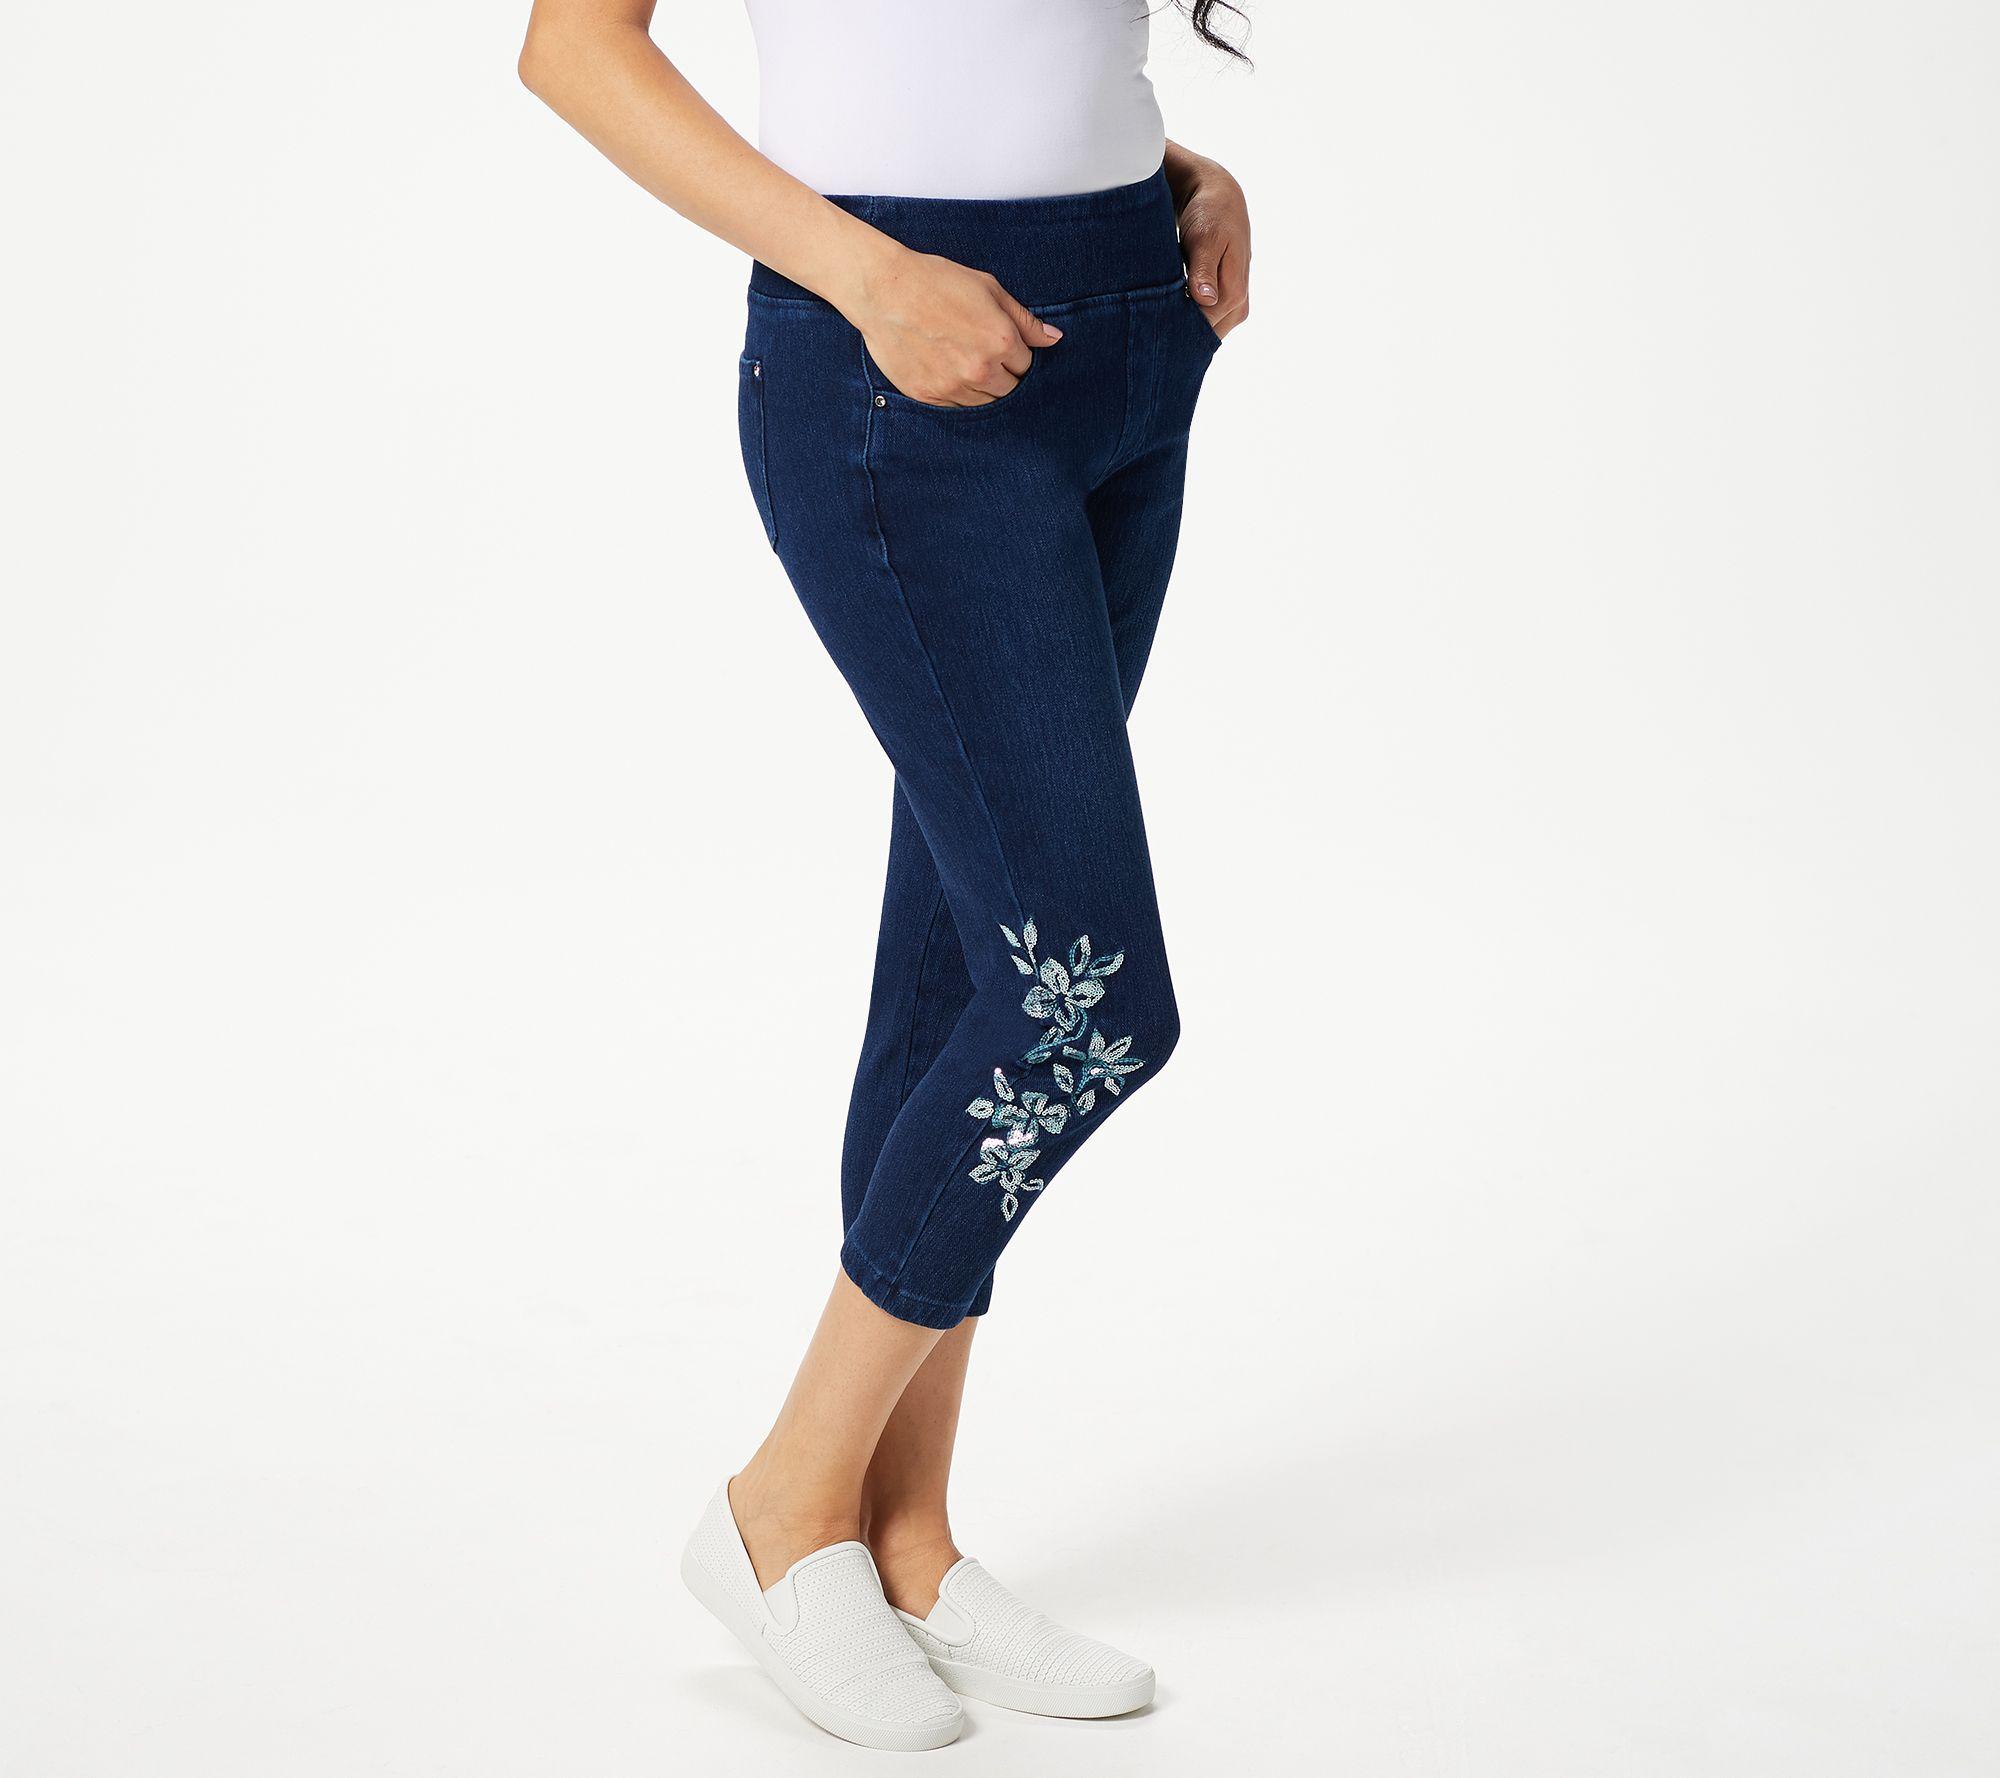 Belle by Kim Gravel Flexibelle Camo Cuffed Cropped Jeans Light Wash Size 14